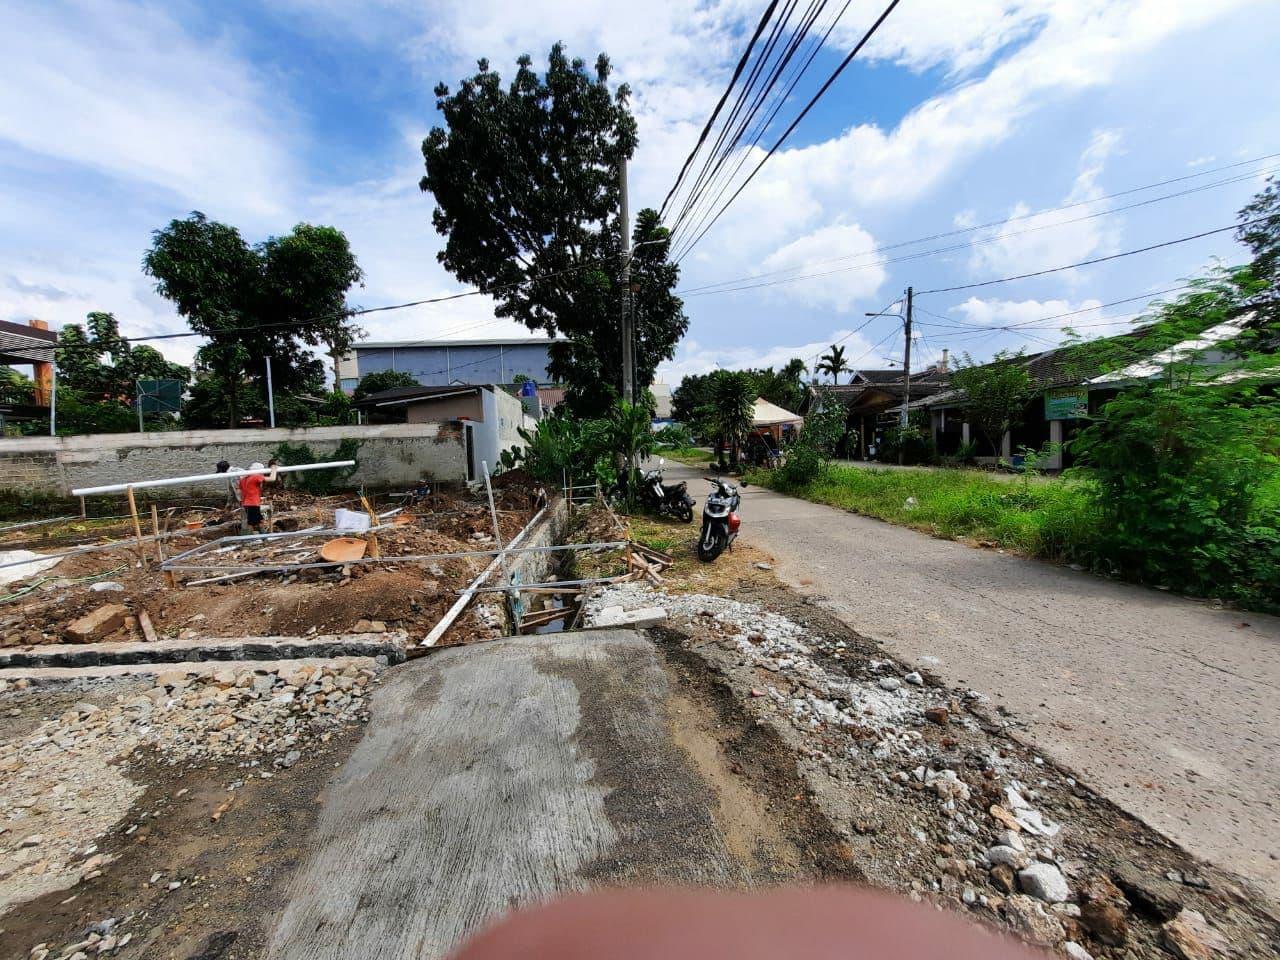 lokasi amanah garden village